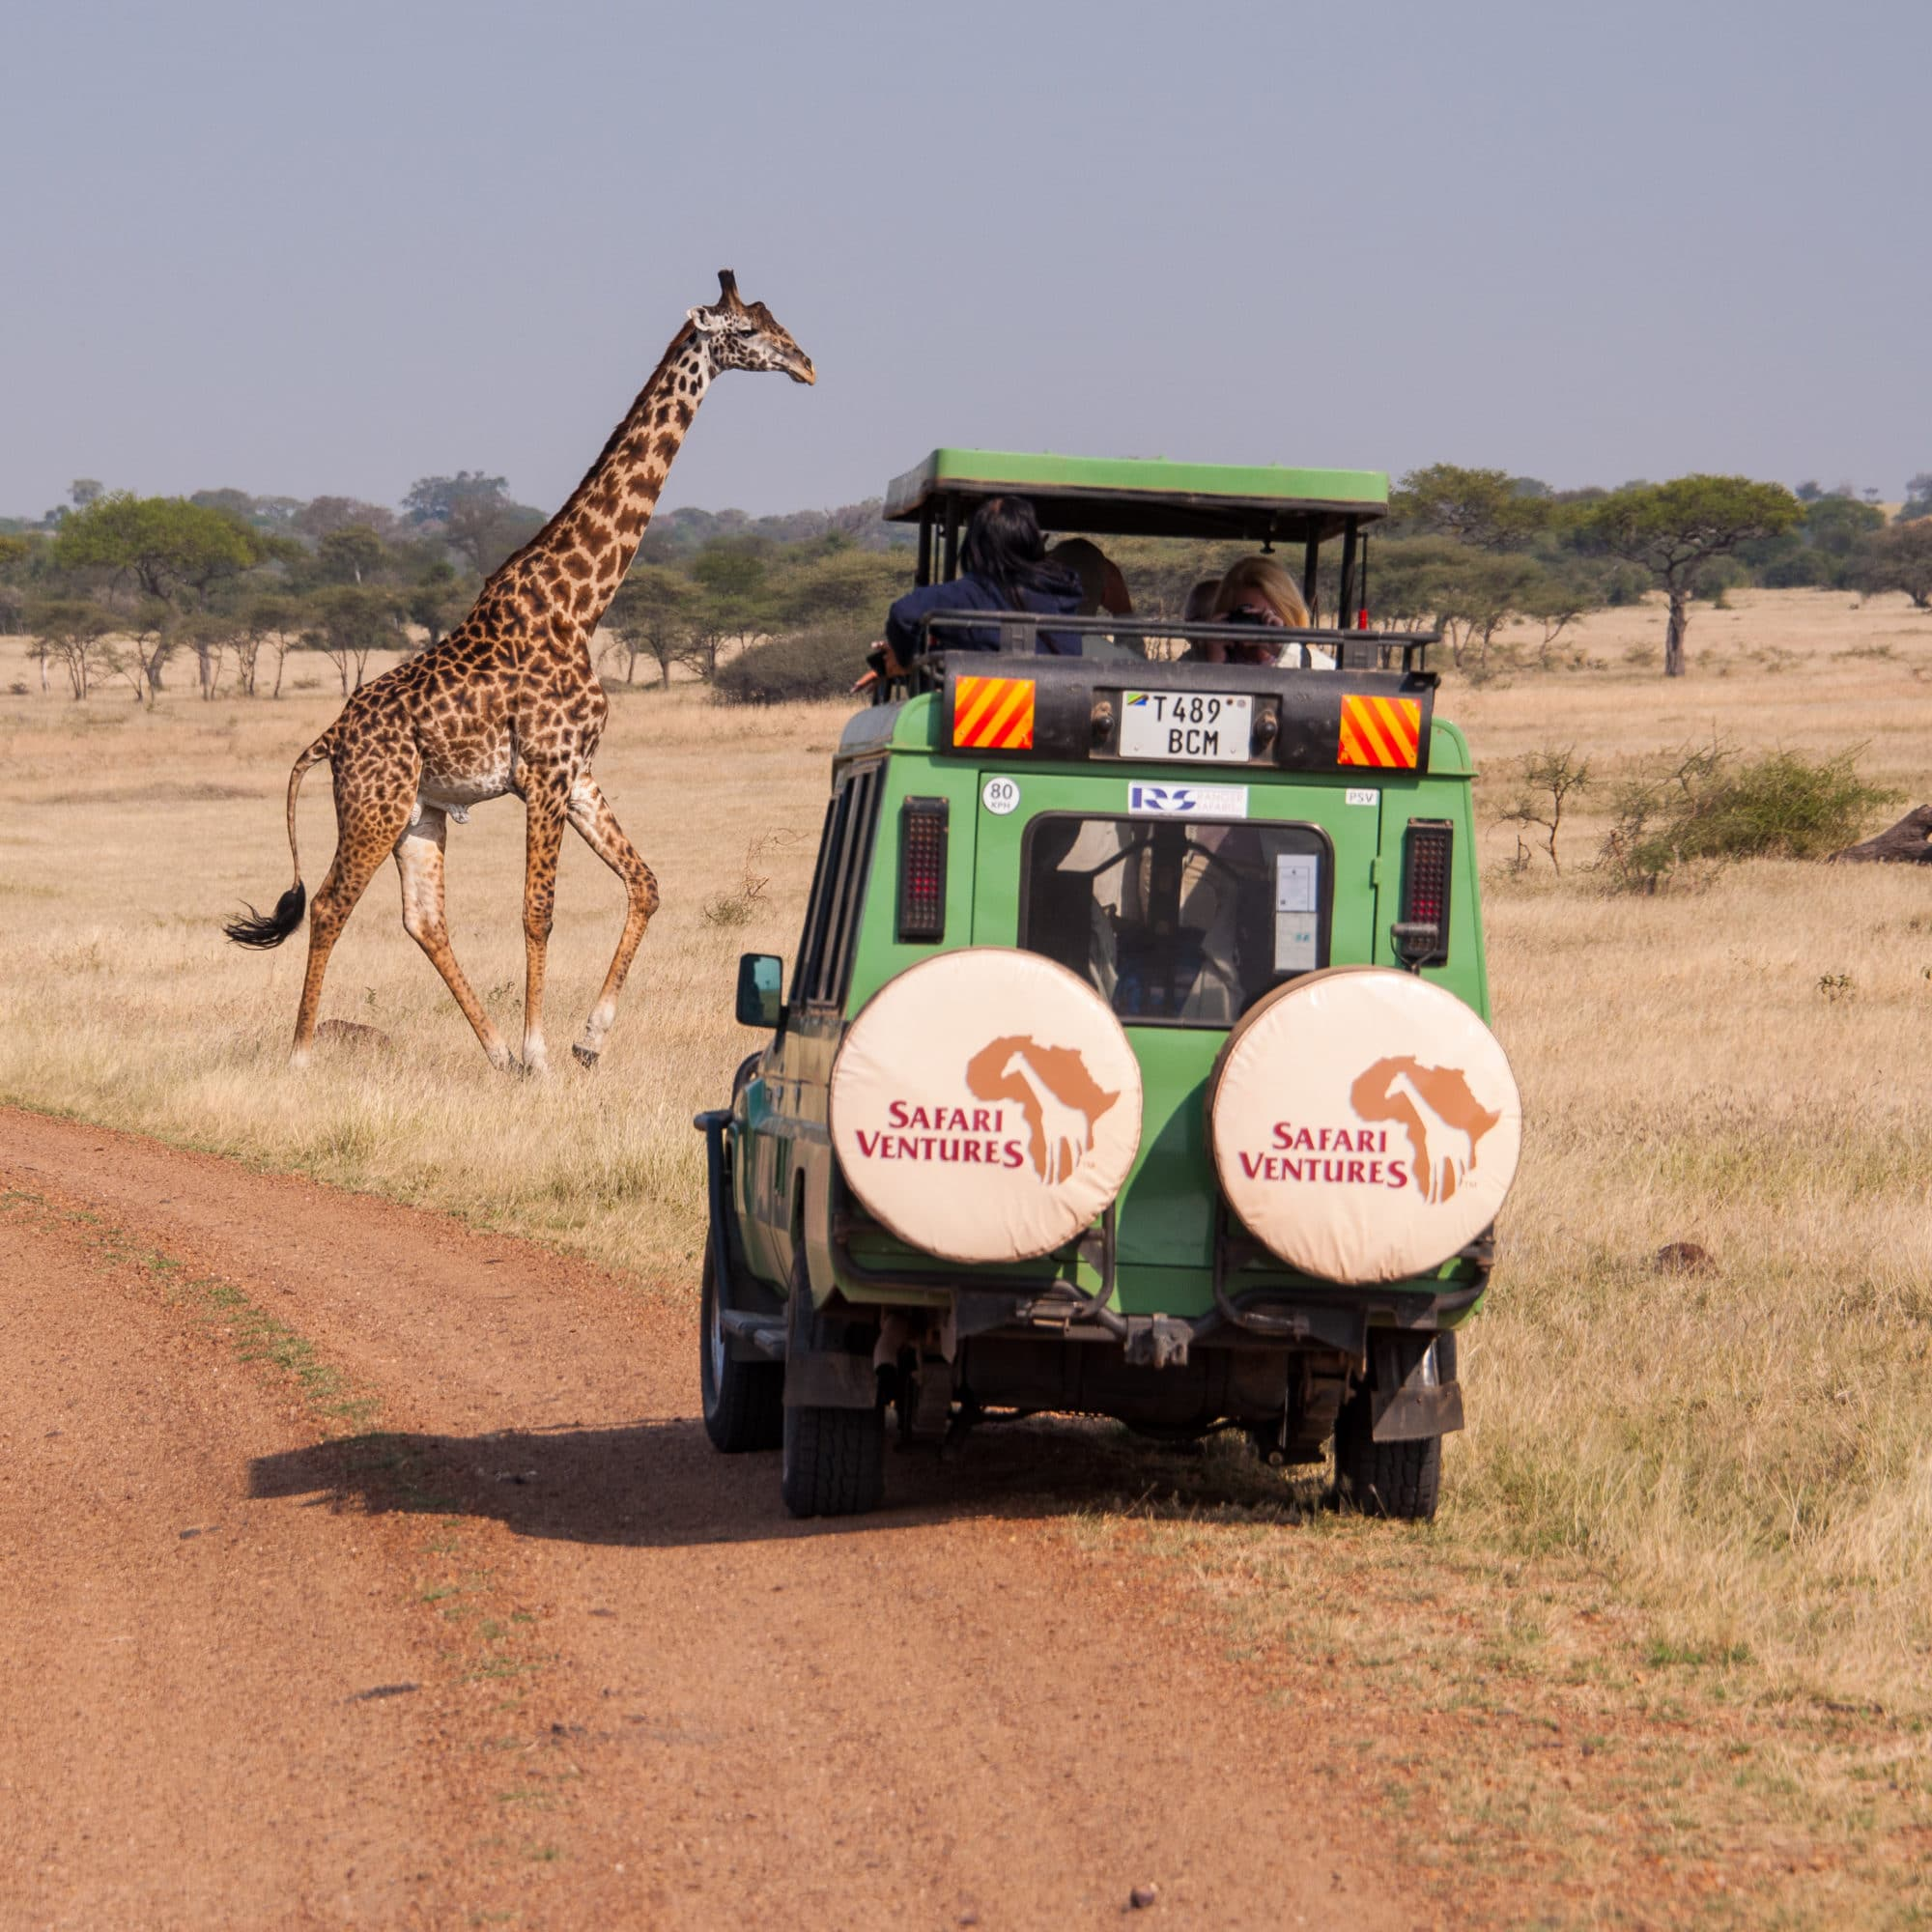 giraffe in front of safari vehicle